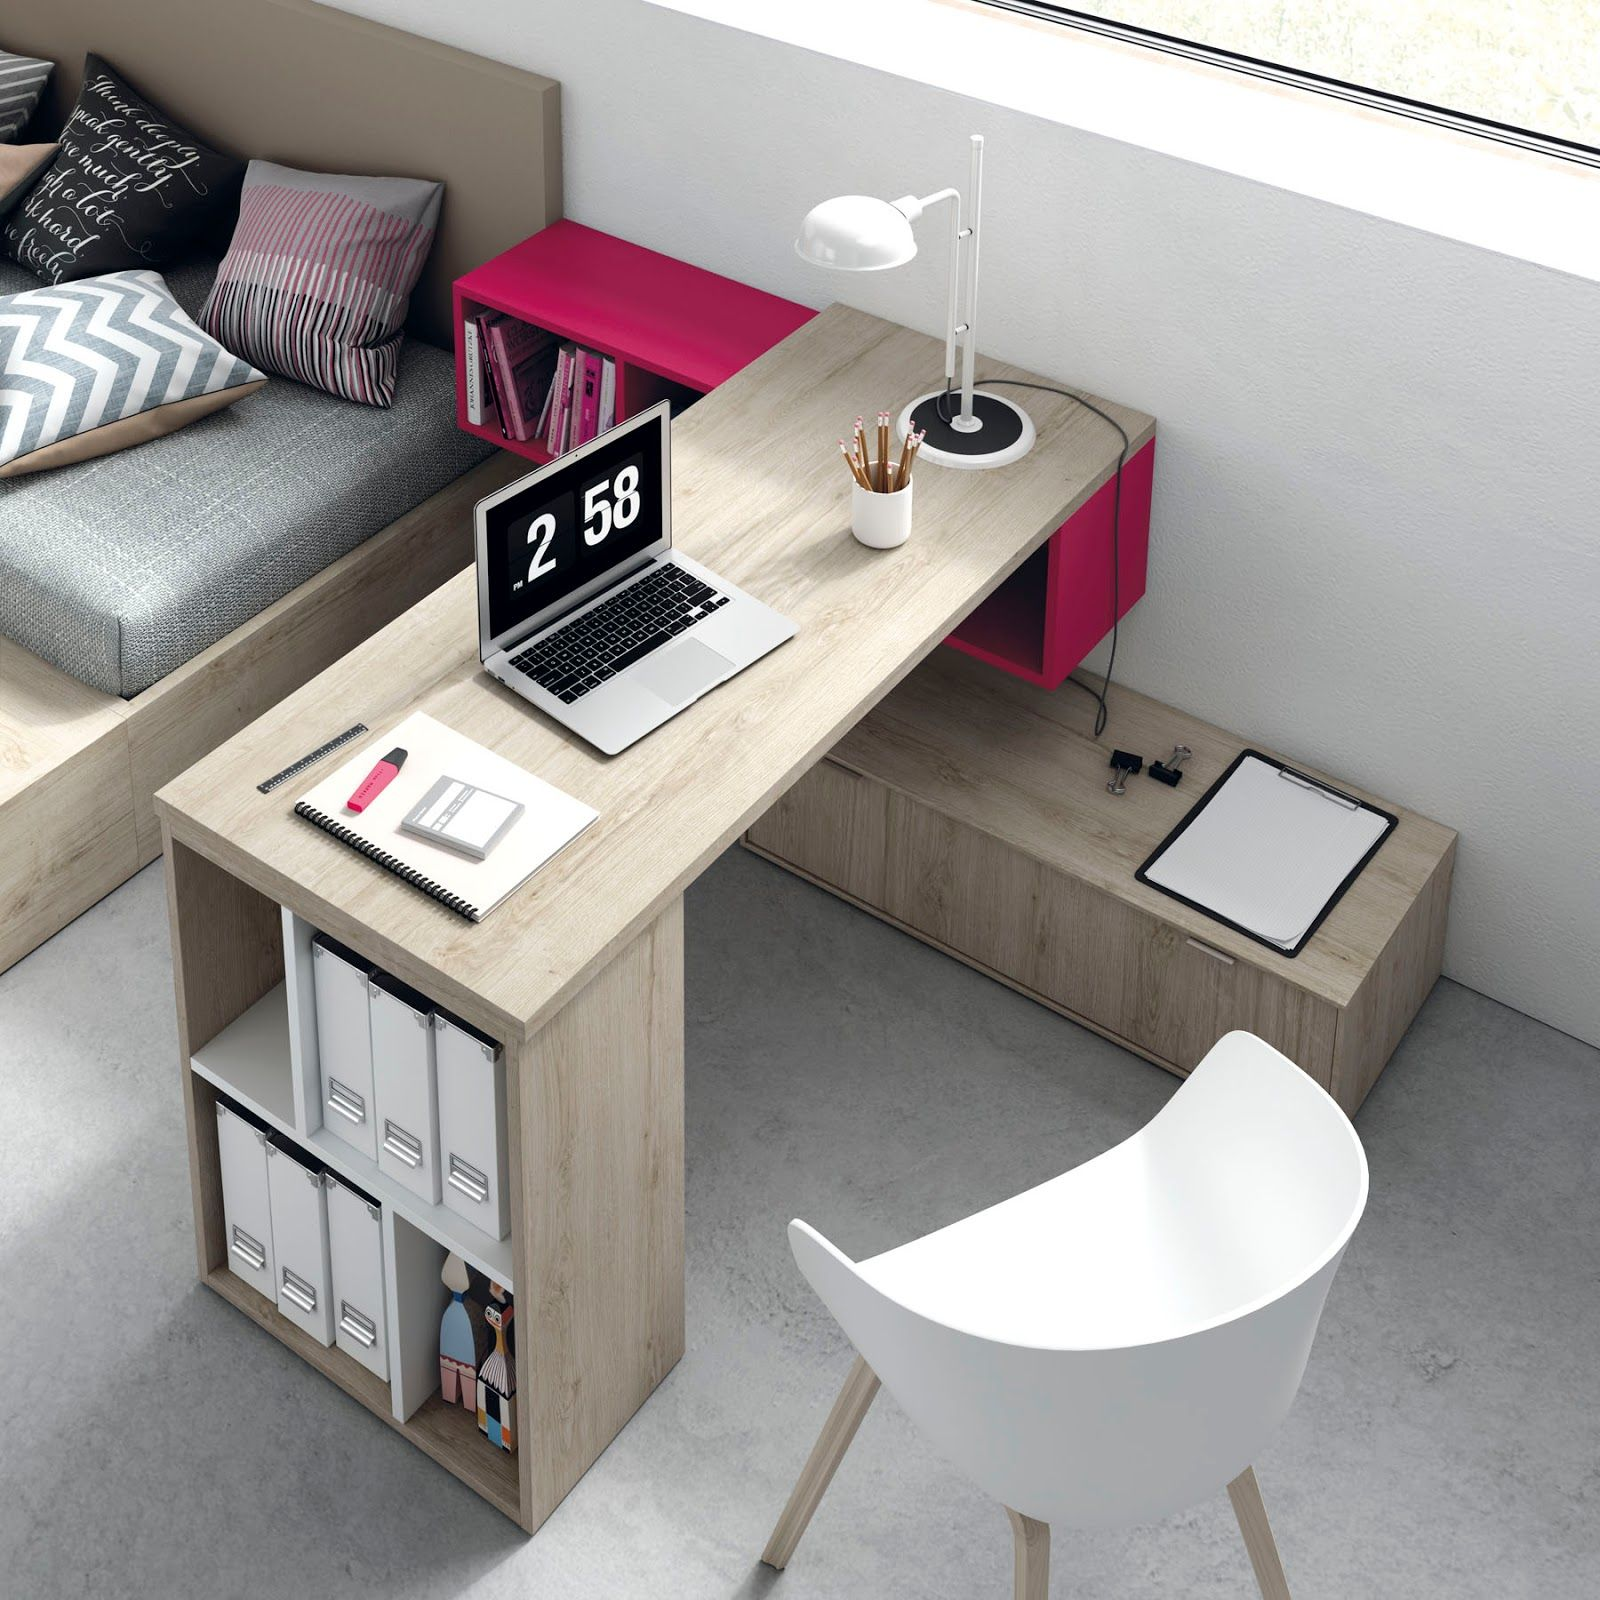 Dormitorios Juveniles E Infantiles Tegar Mobel Zonas De Estudio  # Muebles Tegarmobel